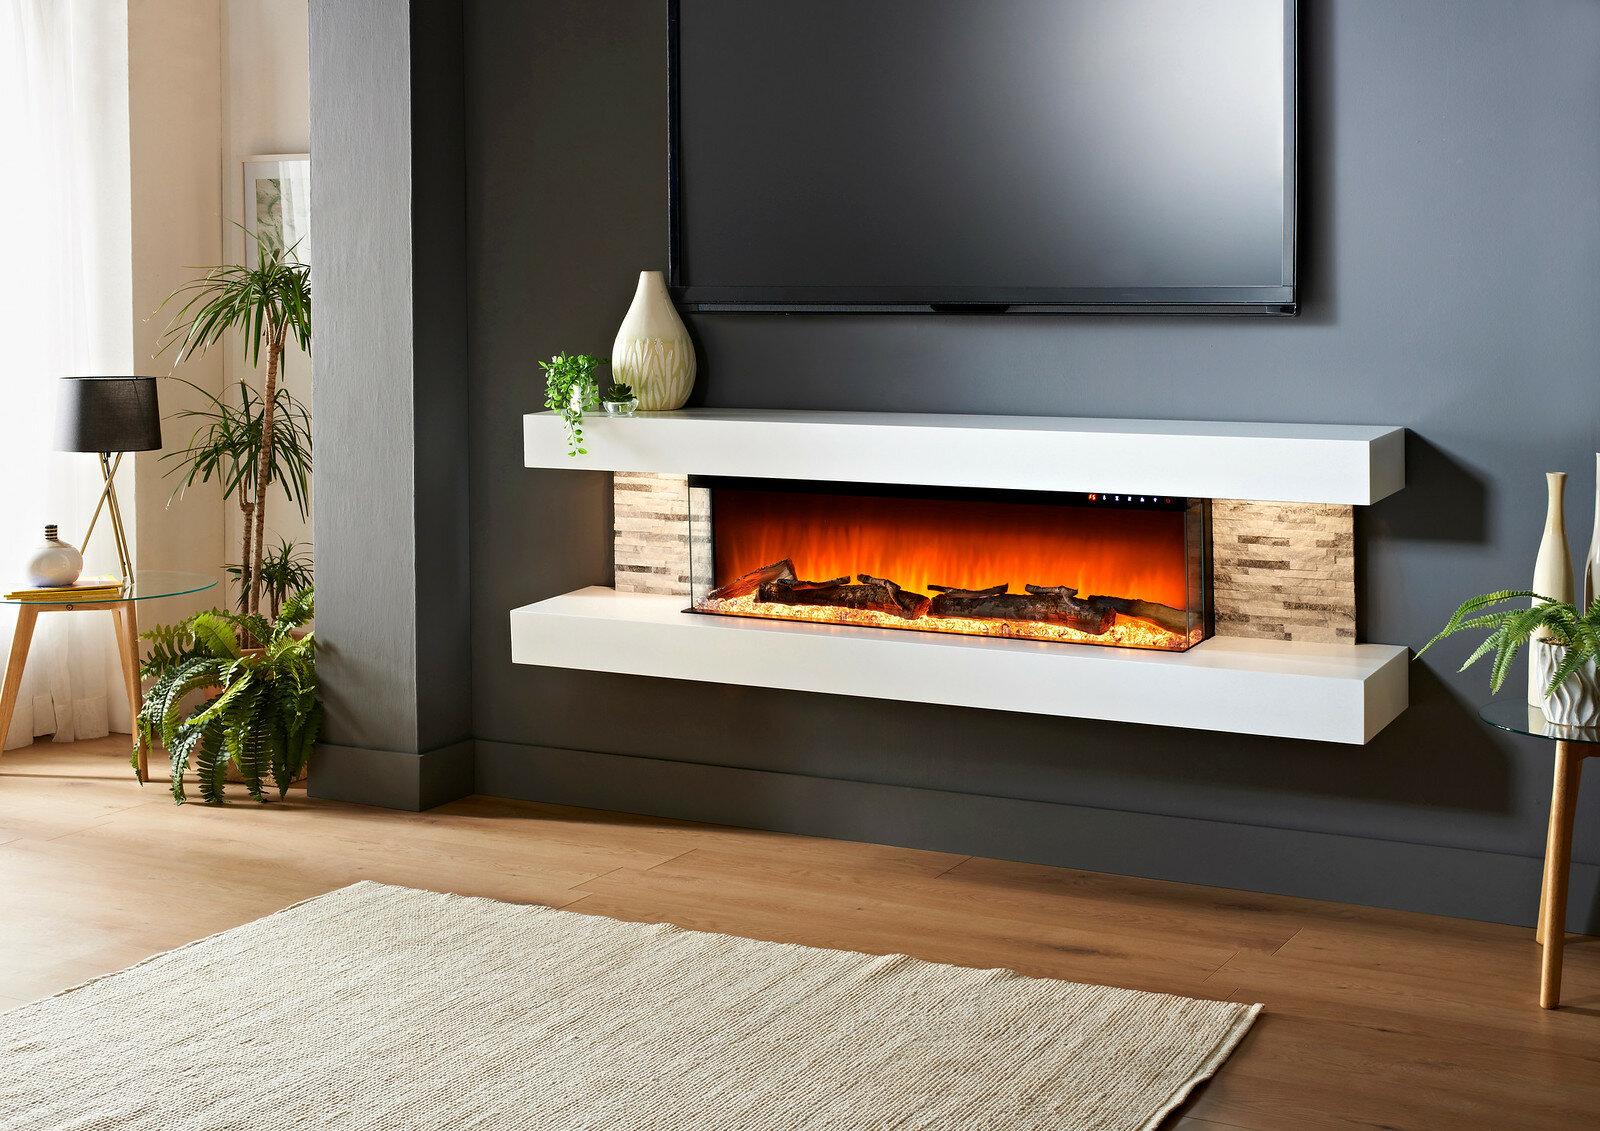 Orren Ellis Katlyn Wall Mounted Electric Fireplace Reviews Wayfair